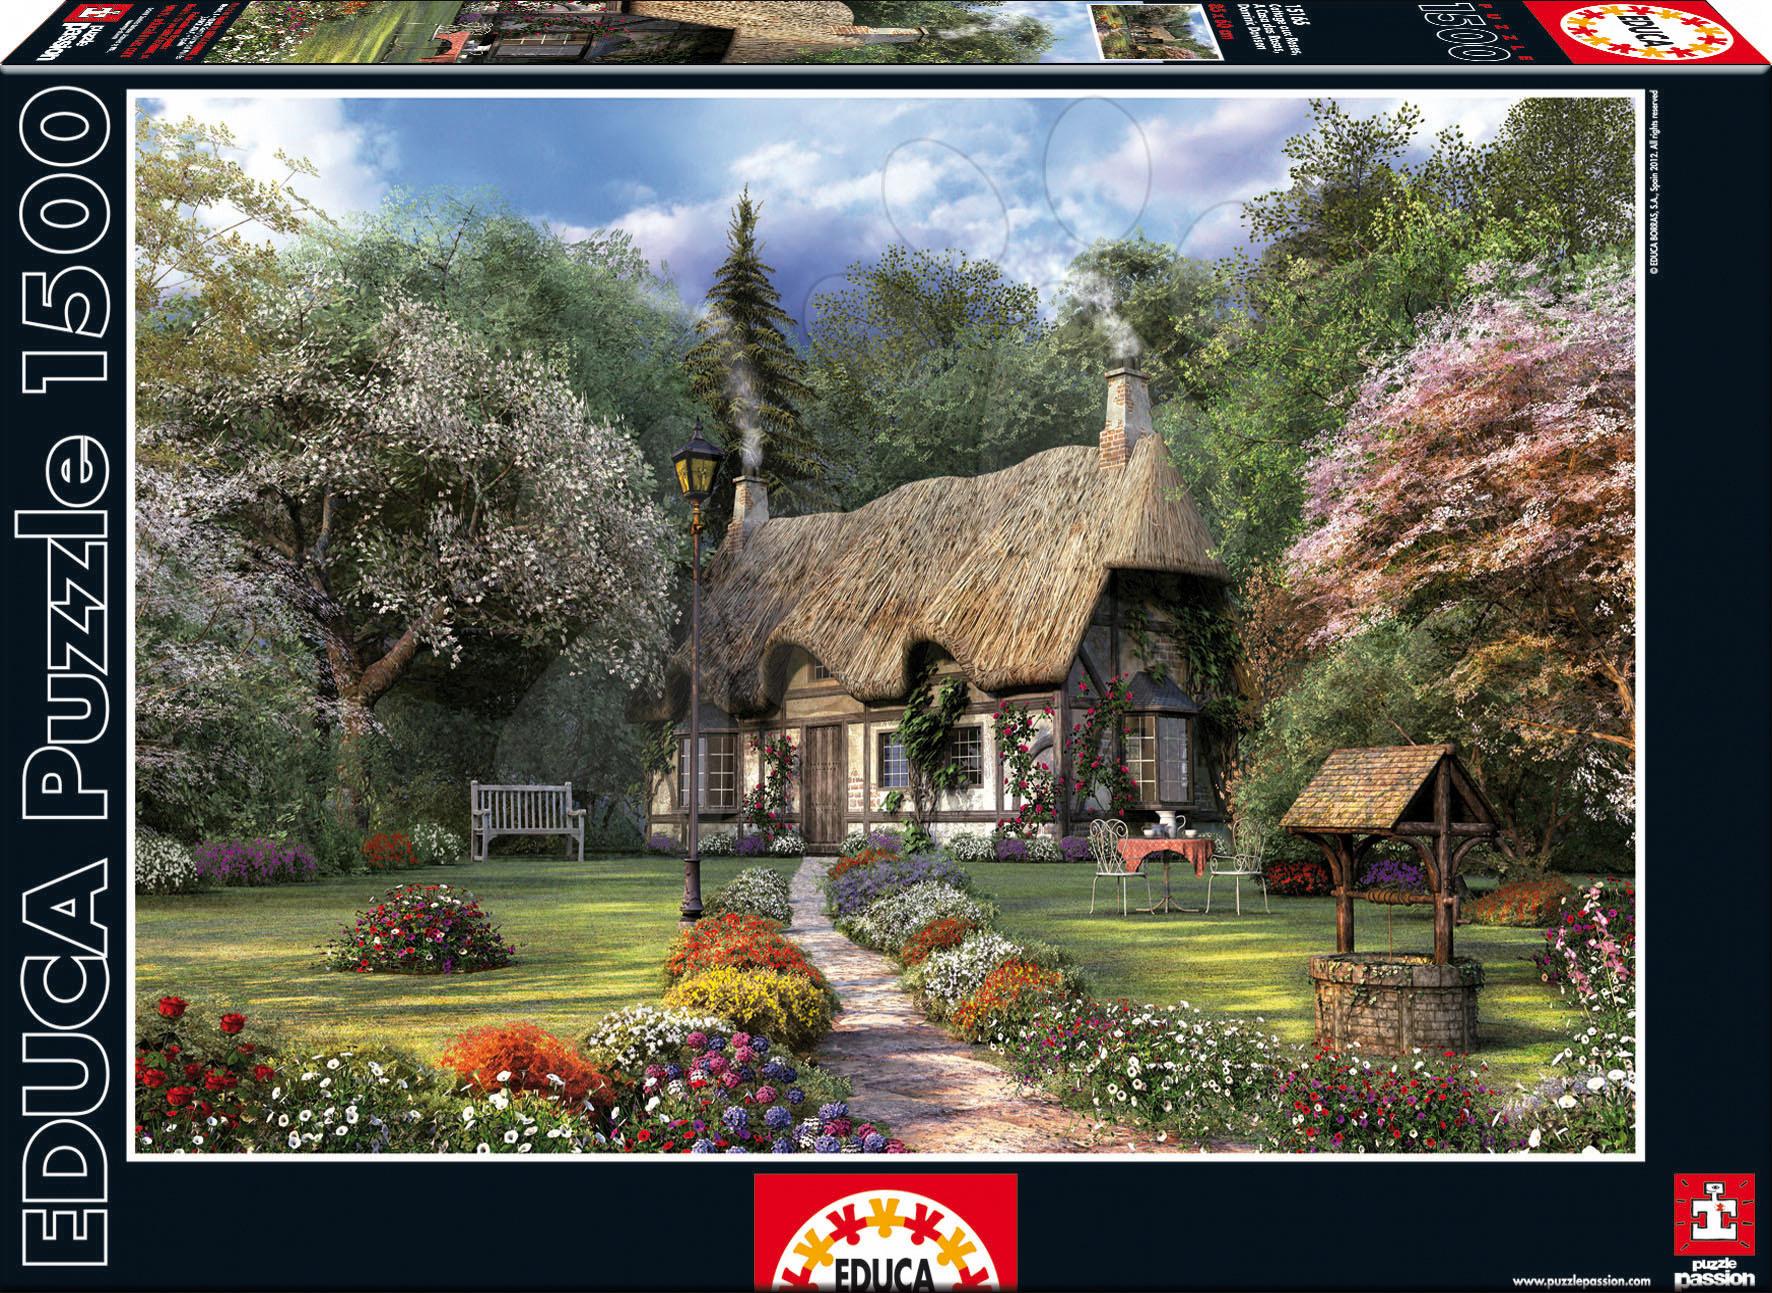 Puzzle 1500 dielne - Puzzle Rose Cottage, J. D. Davison Educa 1500 dielov